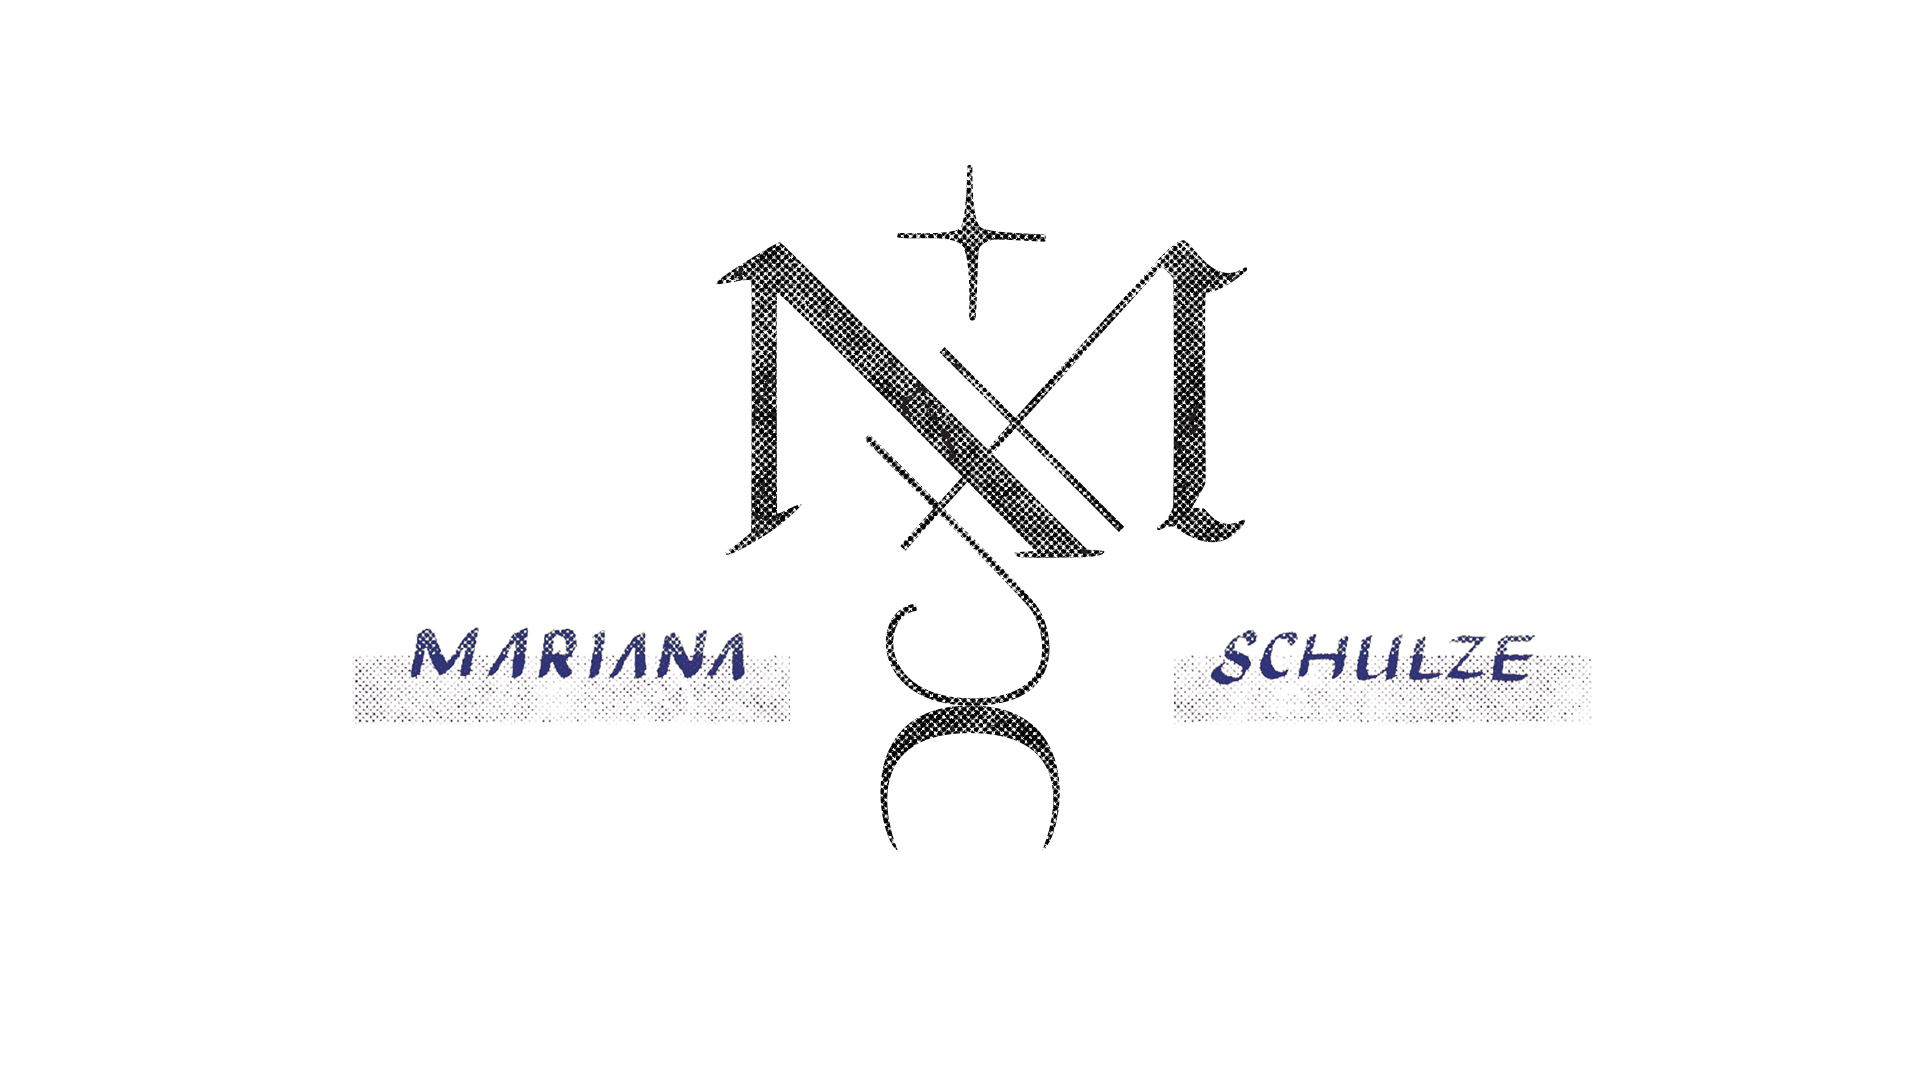 MARIANA-SCHULZE-V3.jpg